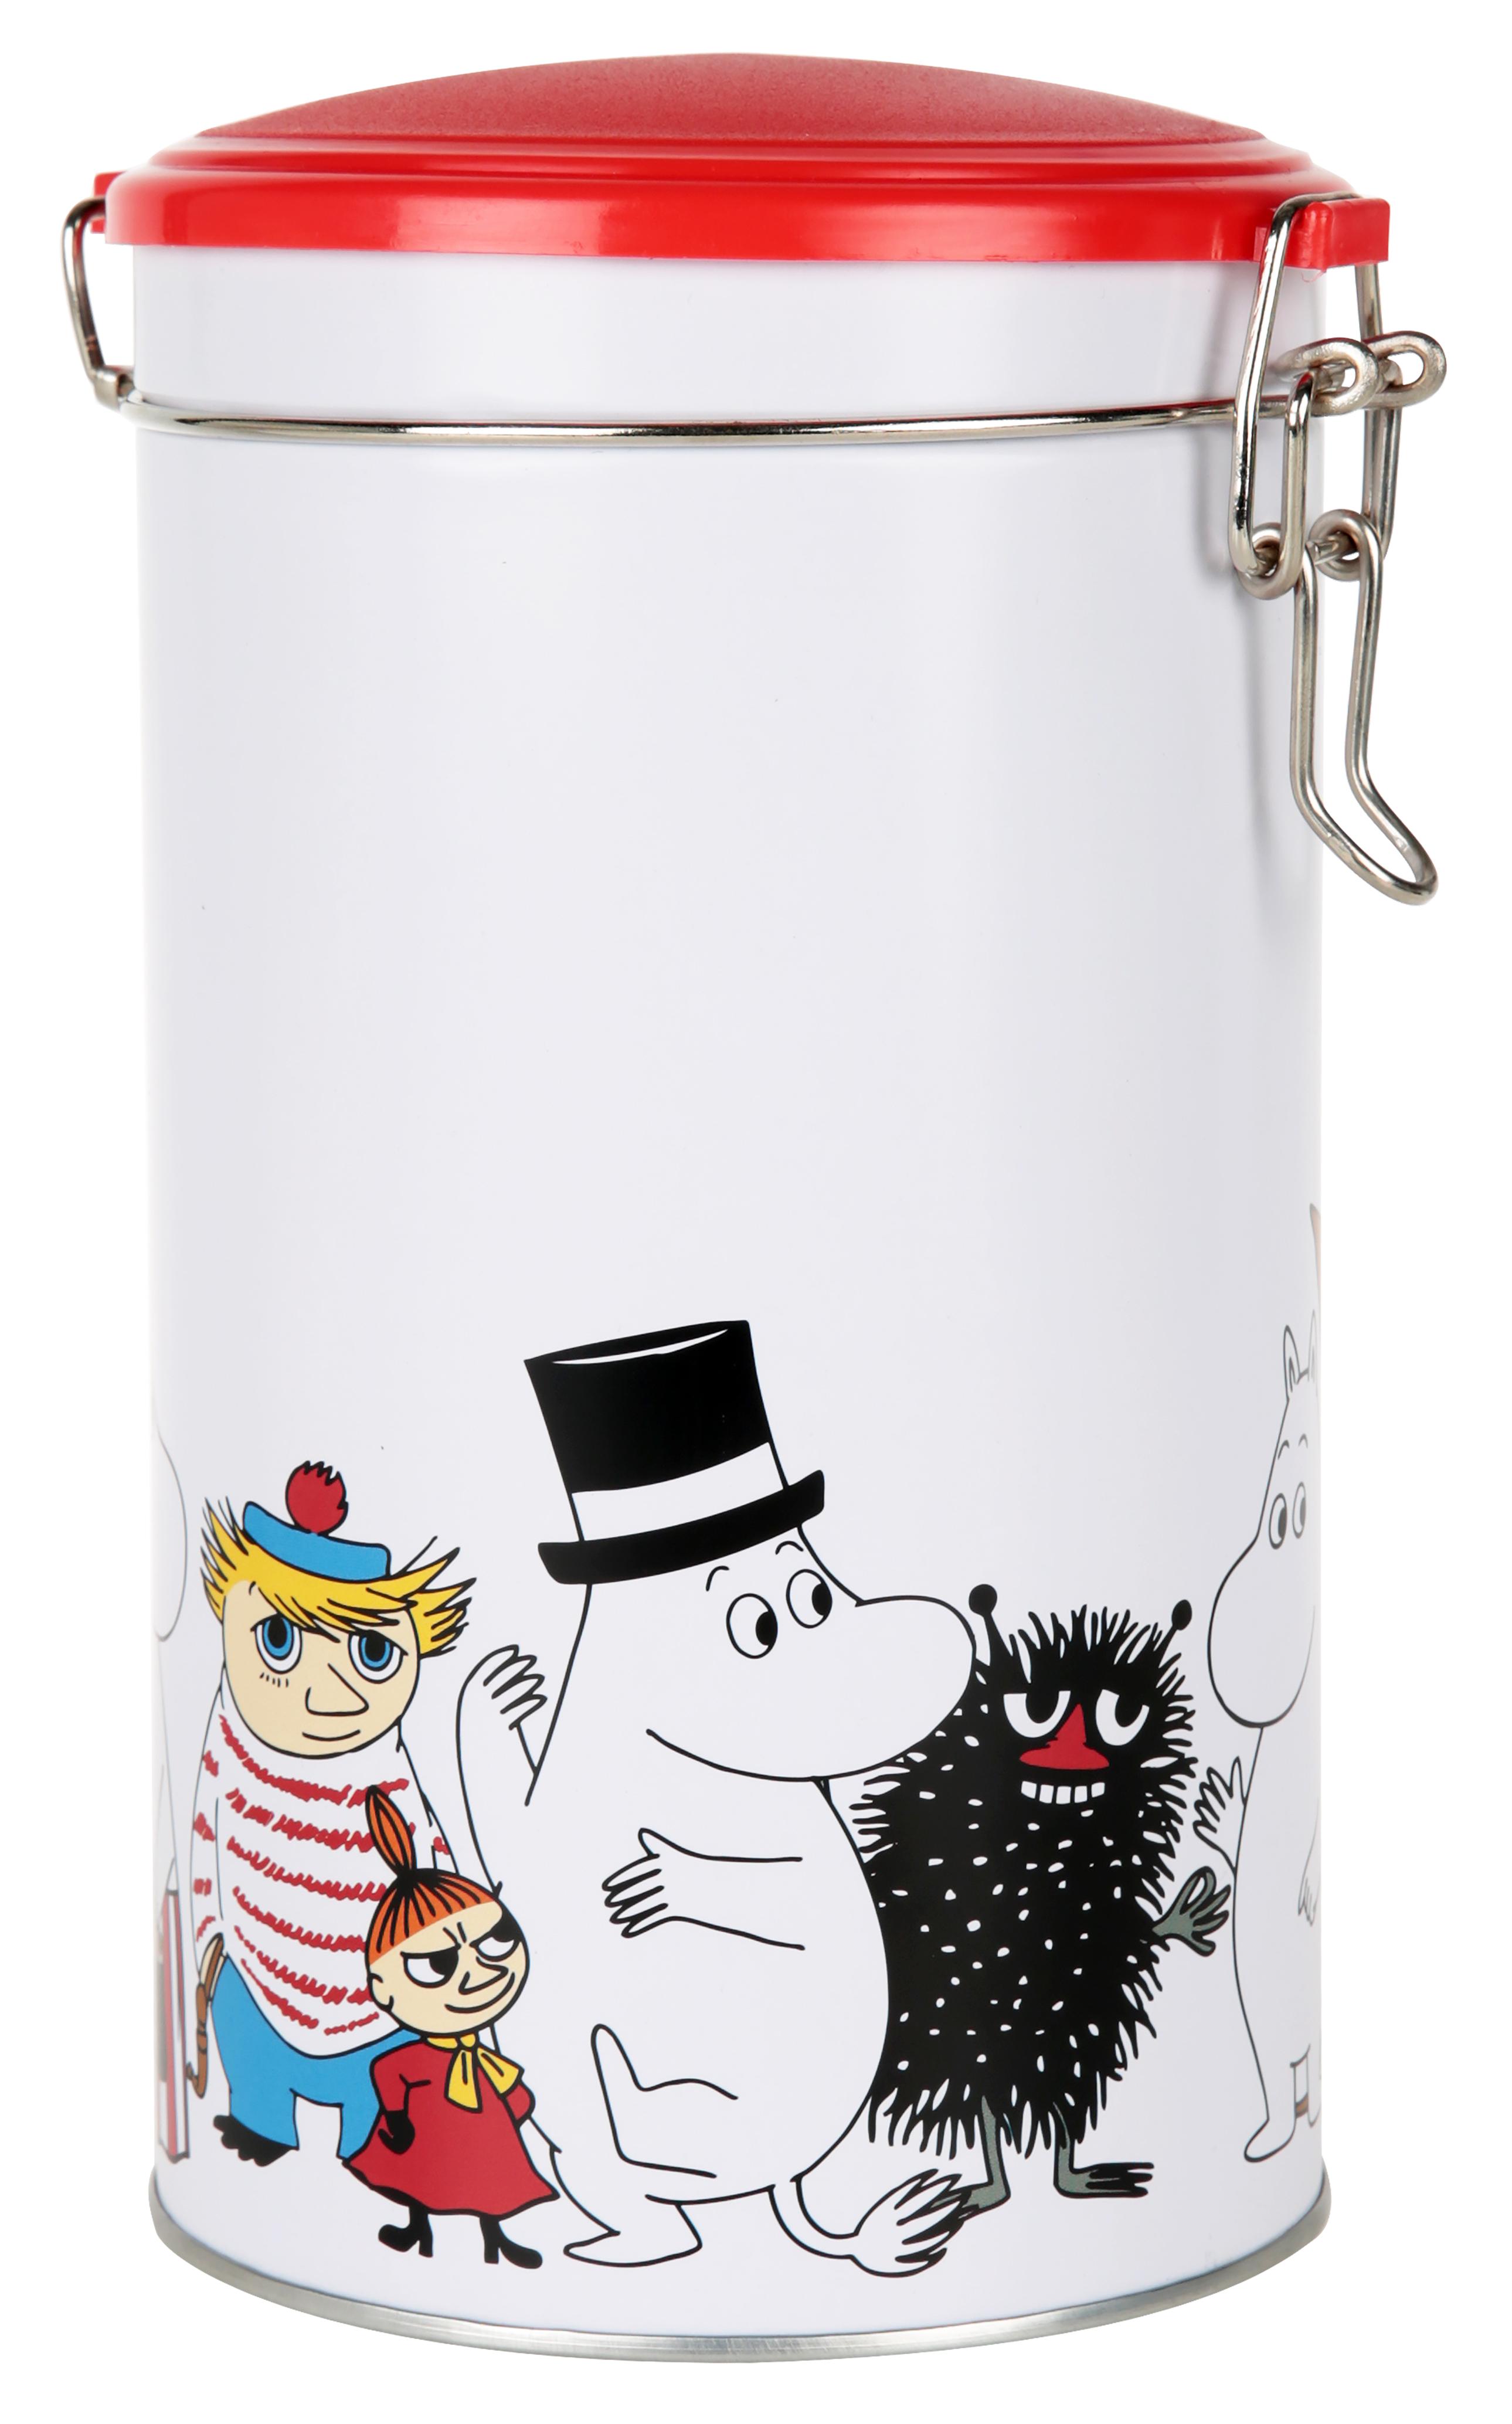 Martinex Moomin Characters Round Coffee Tin